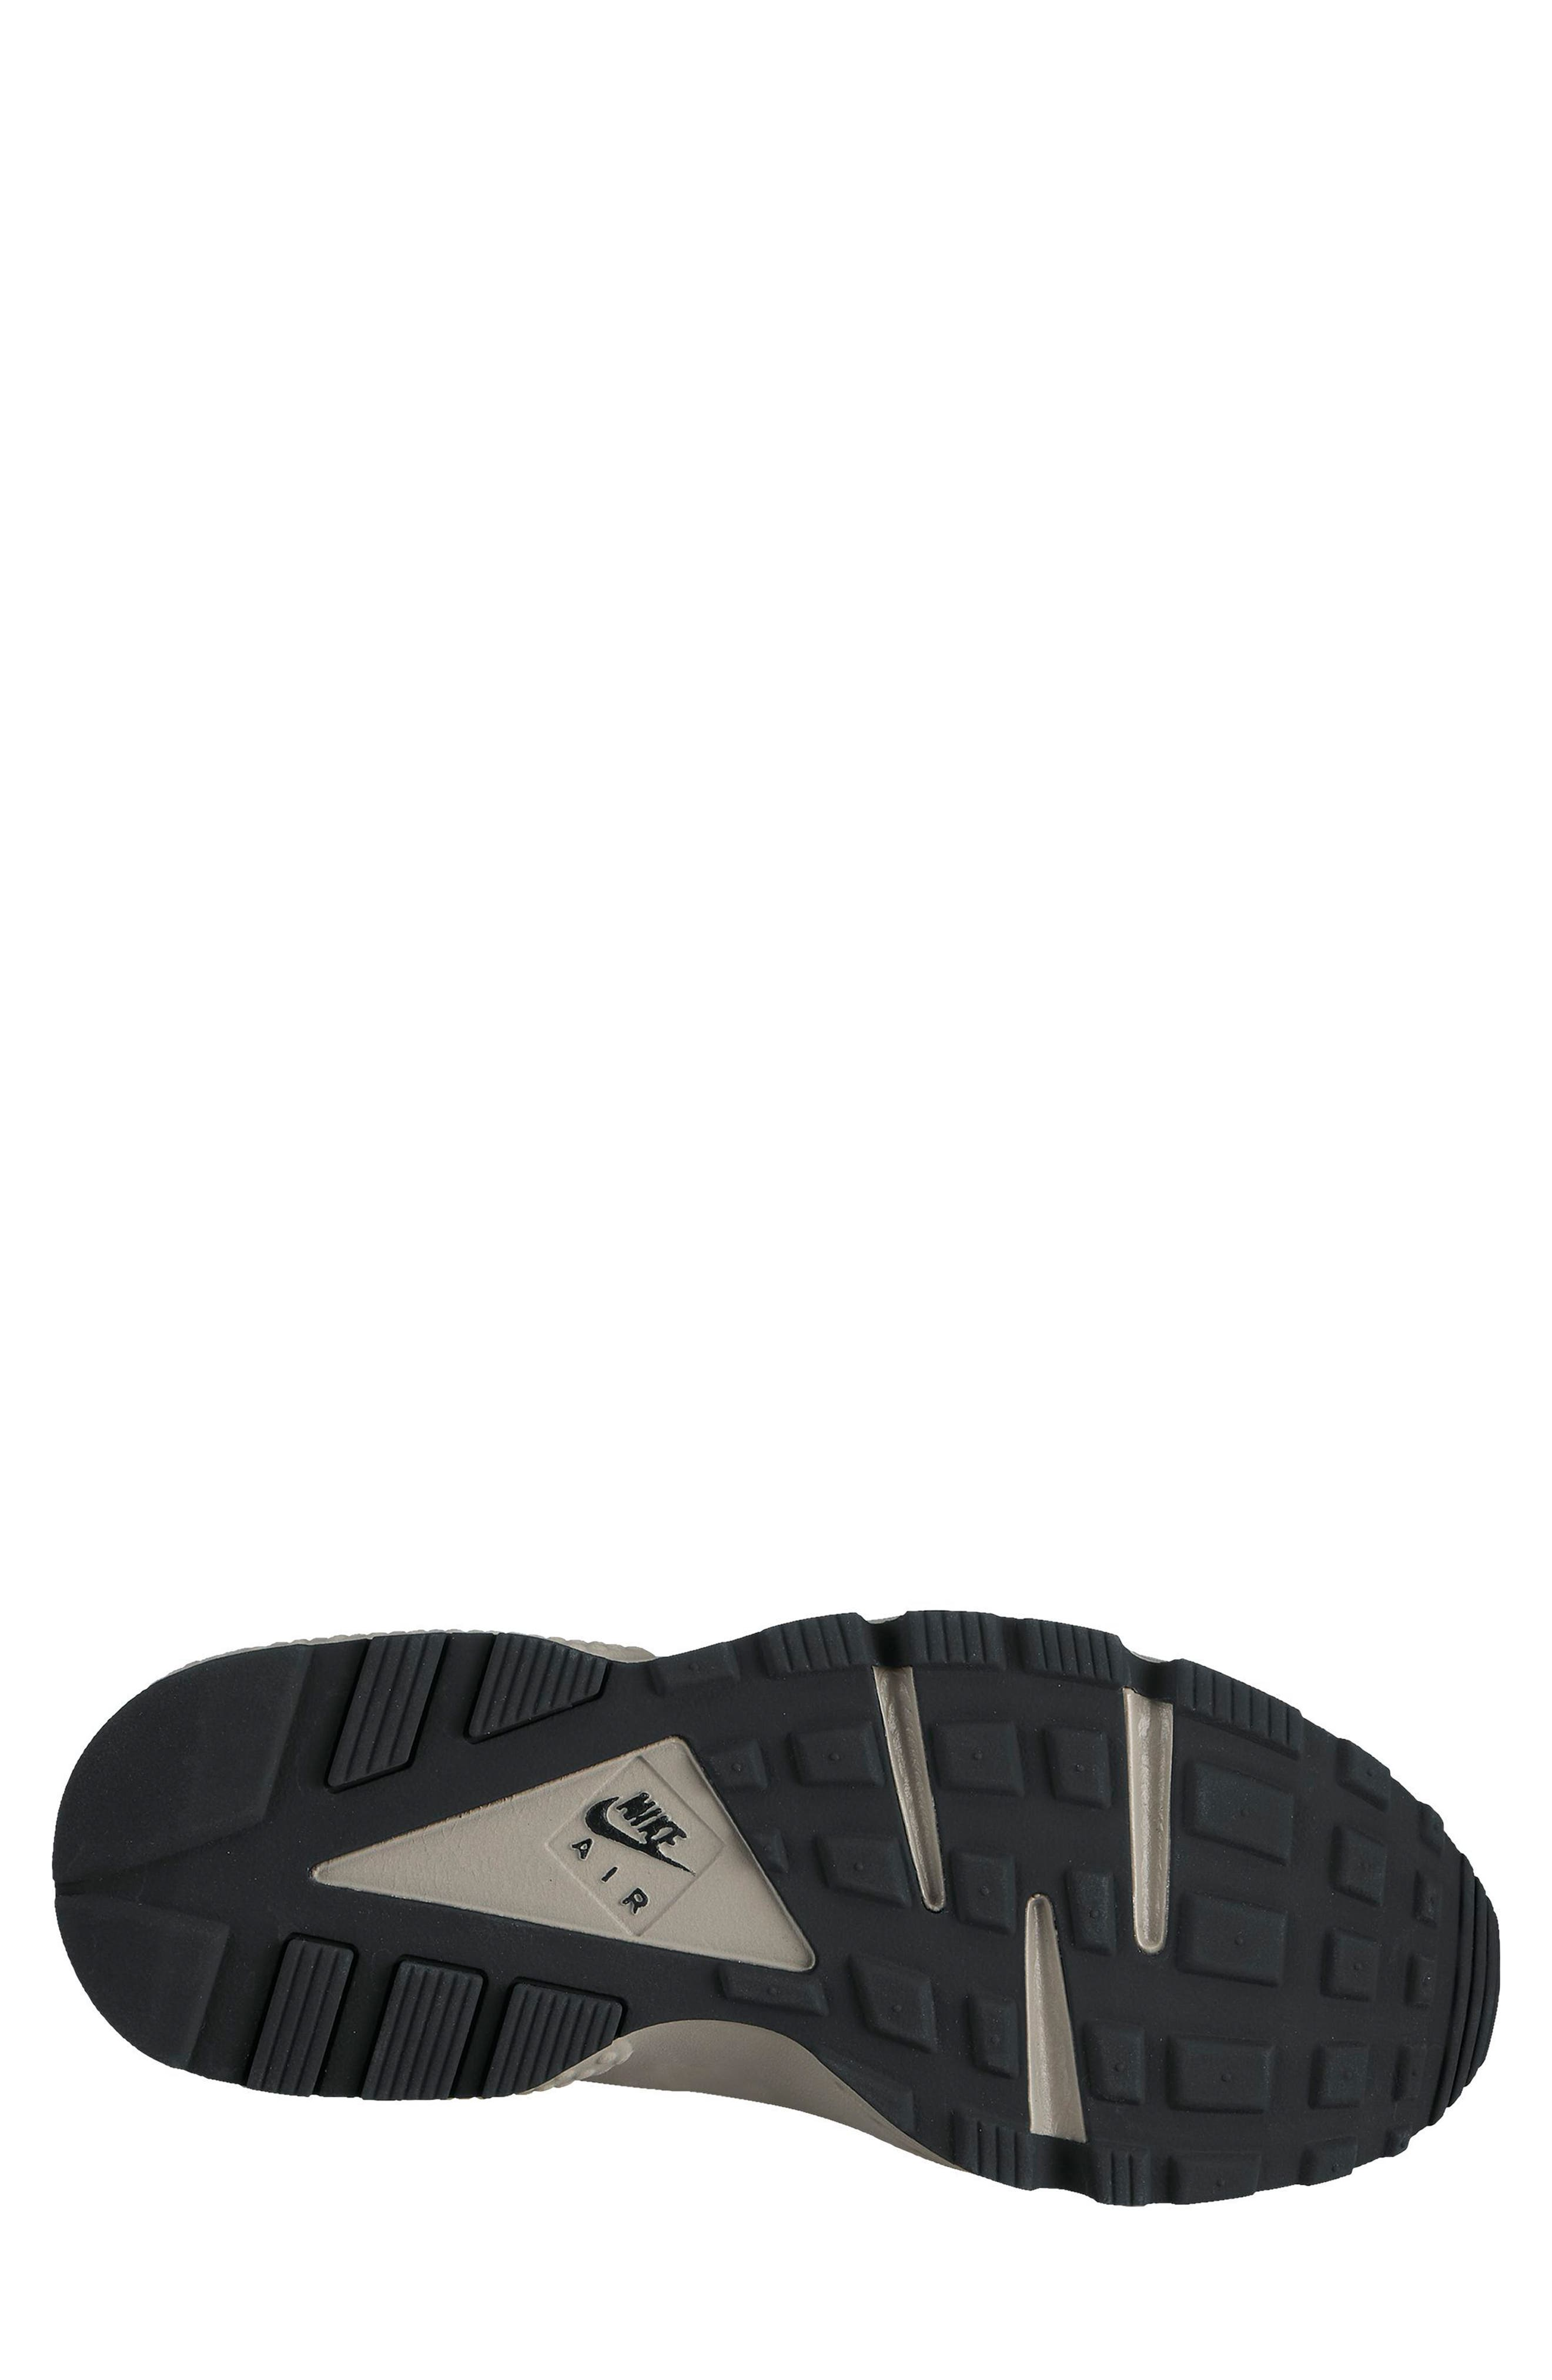 Air Huarache Run SE Sneaker,                             Alternate thumbnail 2, color,                             007